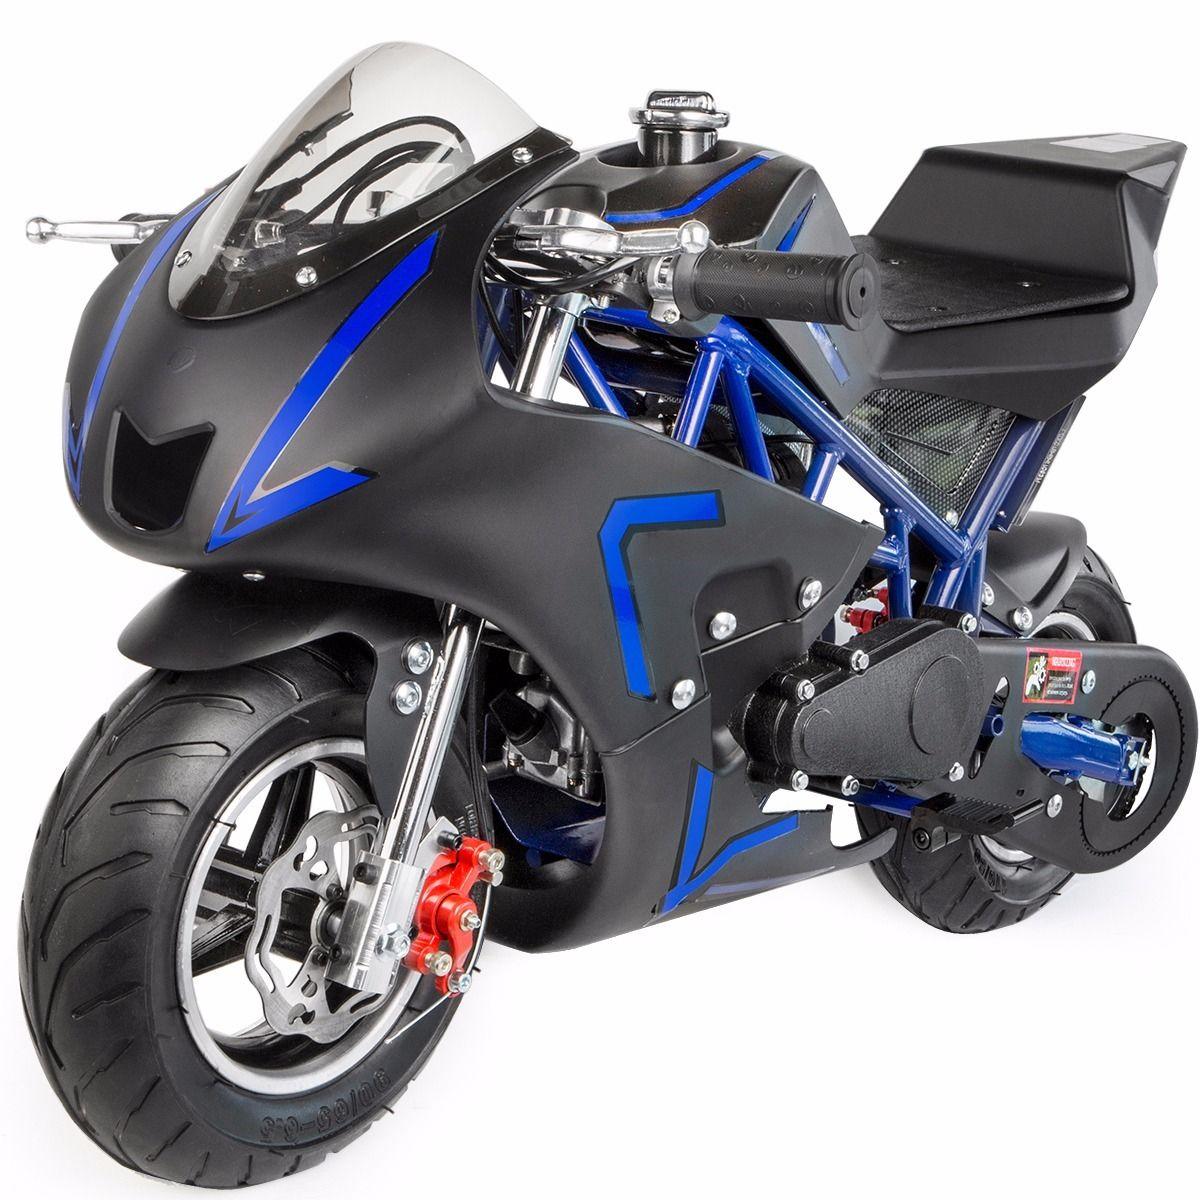 XtremepowerUS-Gas-Pocket-Bike-Motor-Bike-Scooter-40cc-Epa-Engine-Motorcycle thumbnail 7